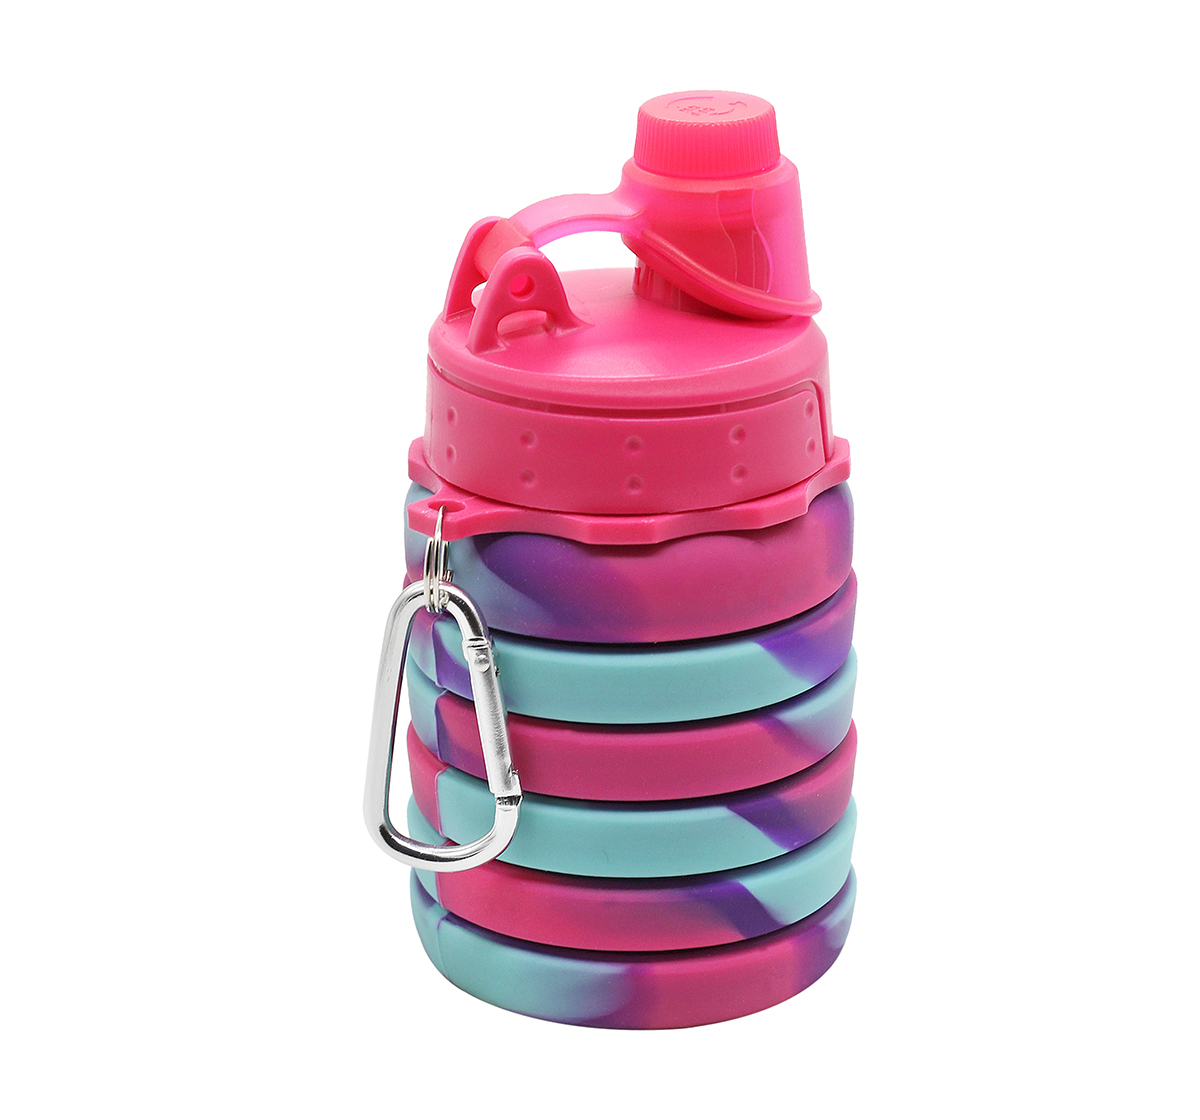 Hamster London   Hamster London Bendable Bottle with Carabiner Clip for Kids age 3Y+ (Pink)